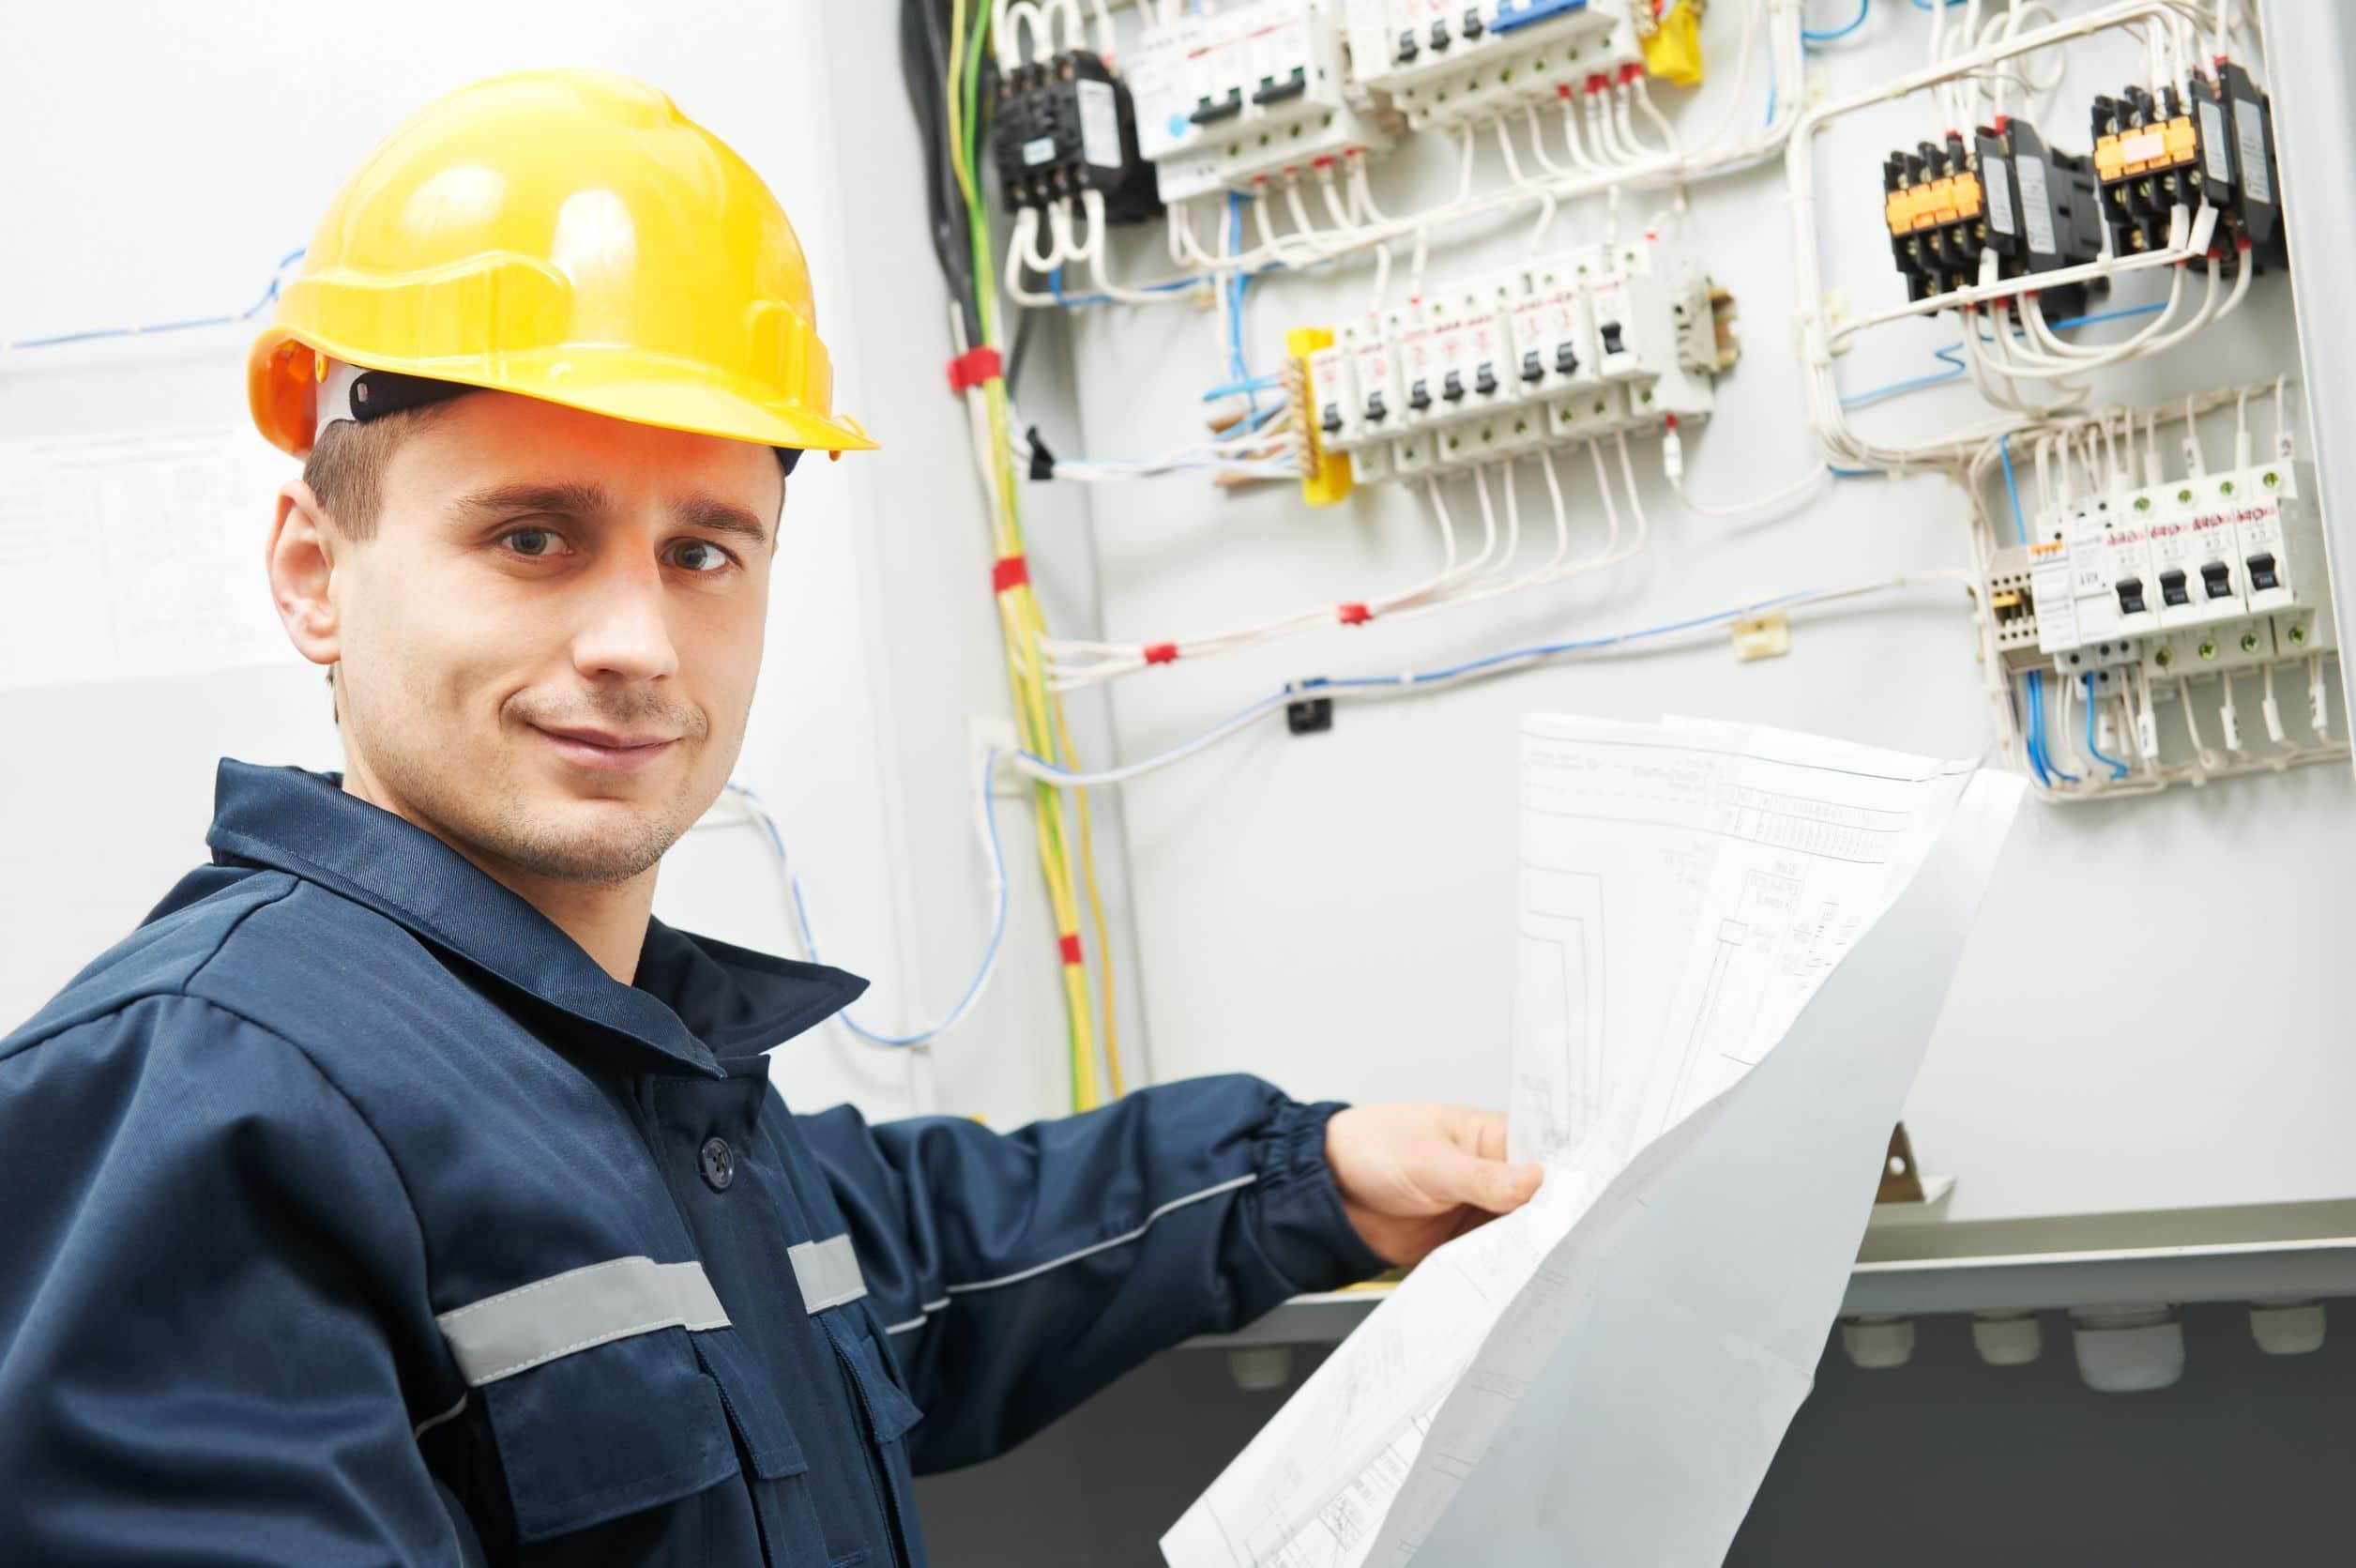 Elektro-Sicherheitsberater Elektro-Kontrolleur